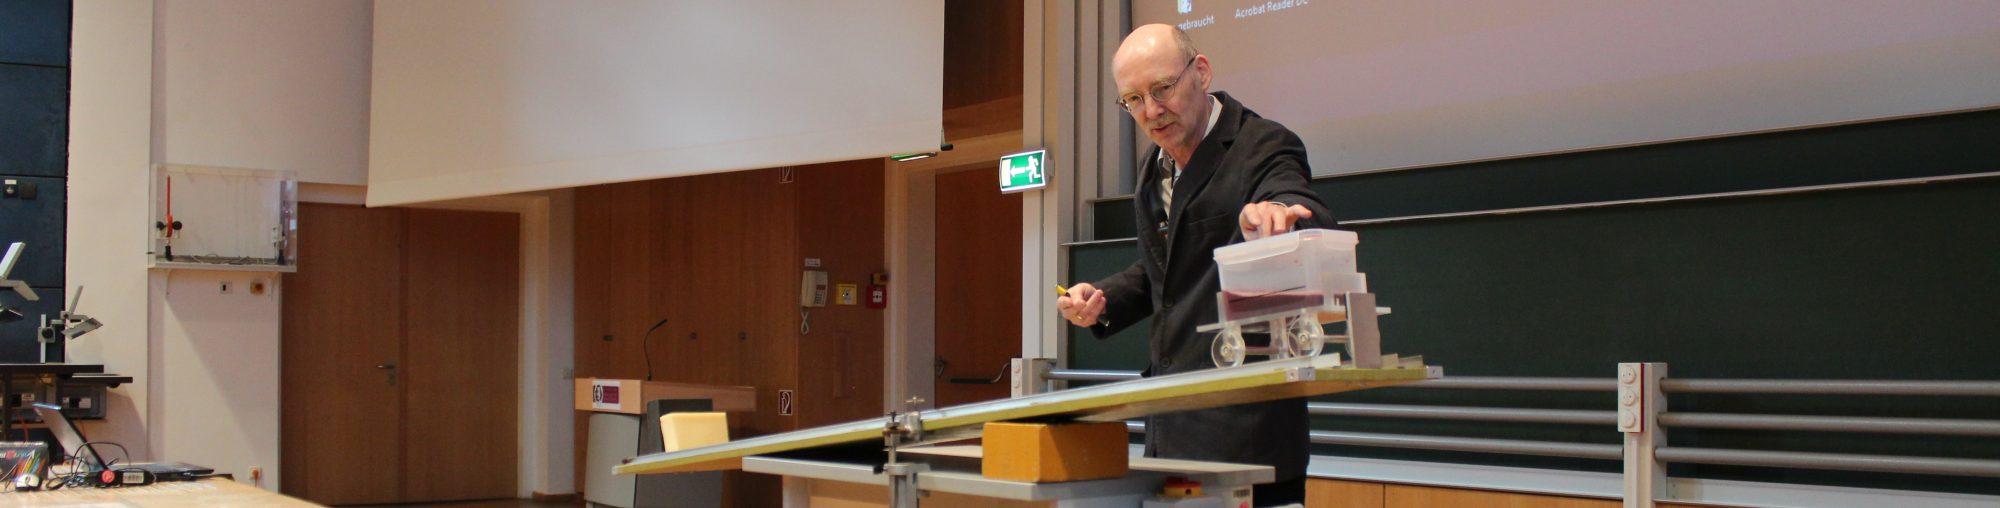 Physikolympiade in Sachsen-Anhalt